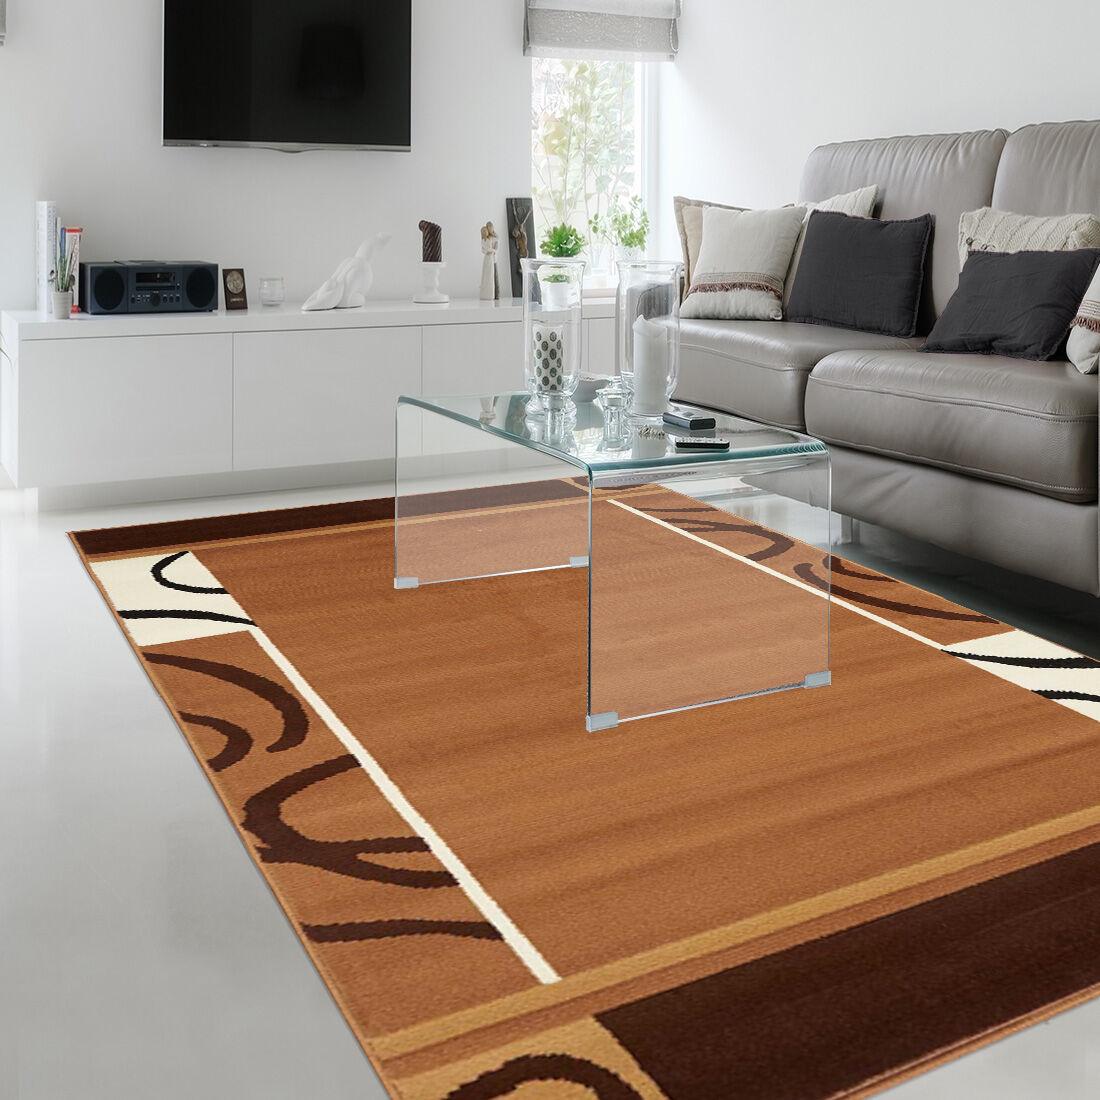 Unamourdetapis Tapis tapis de salon BC ESPACE marron Tapis Moderne marron 60 x 110 cm Alfombra sala de estar